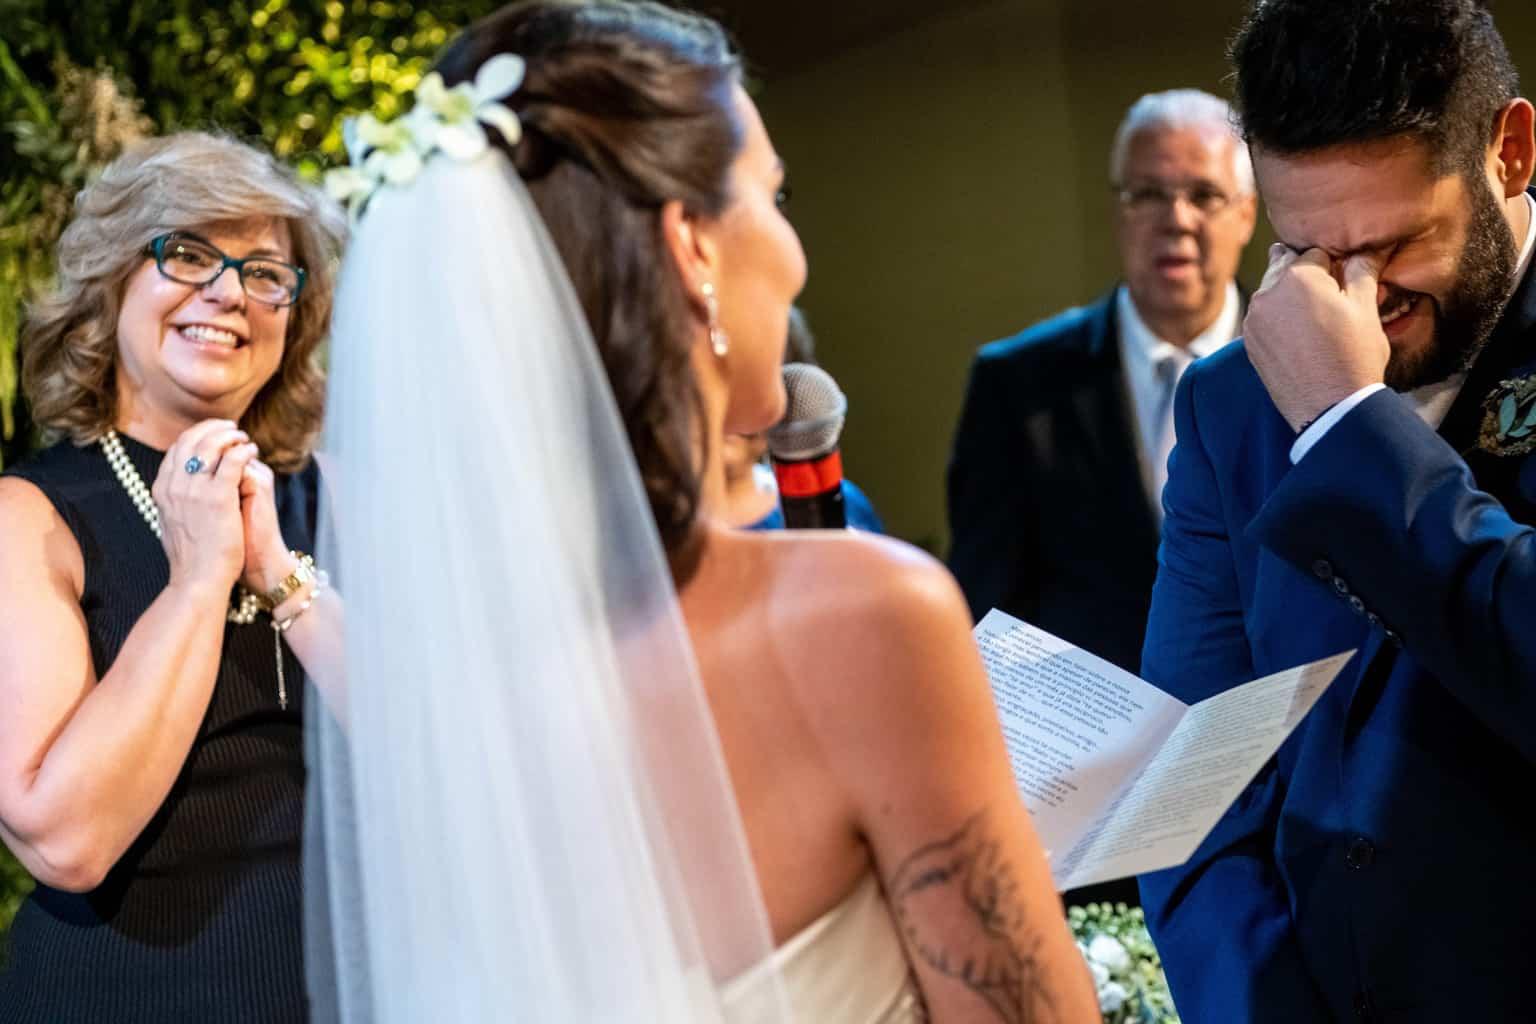 Bel-Benkler-eventos-Casamento-Ariane-e-Matheus-cerimonia-decoracao-contemporanea-fotografia-Rafael-Bigarelli-noivos-na-pista-Spazio-Giardini-42